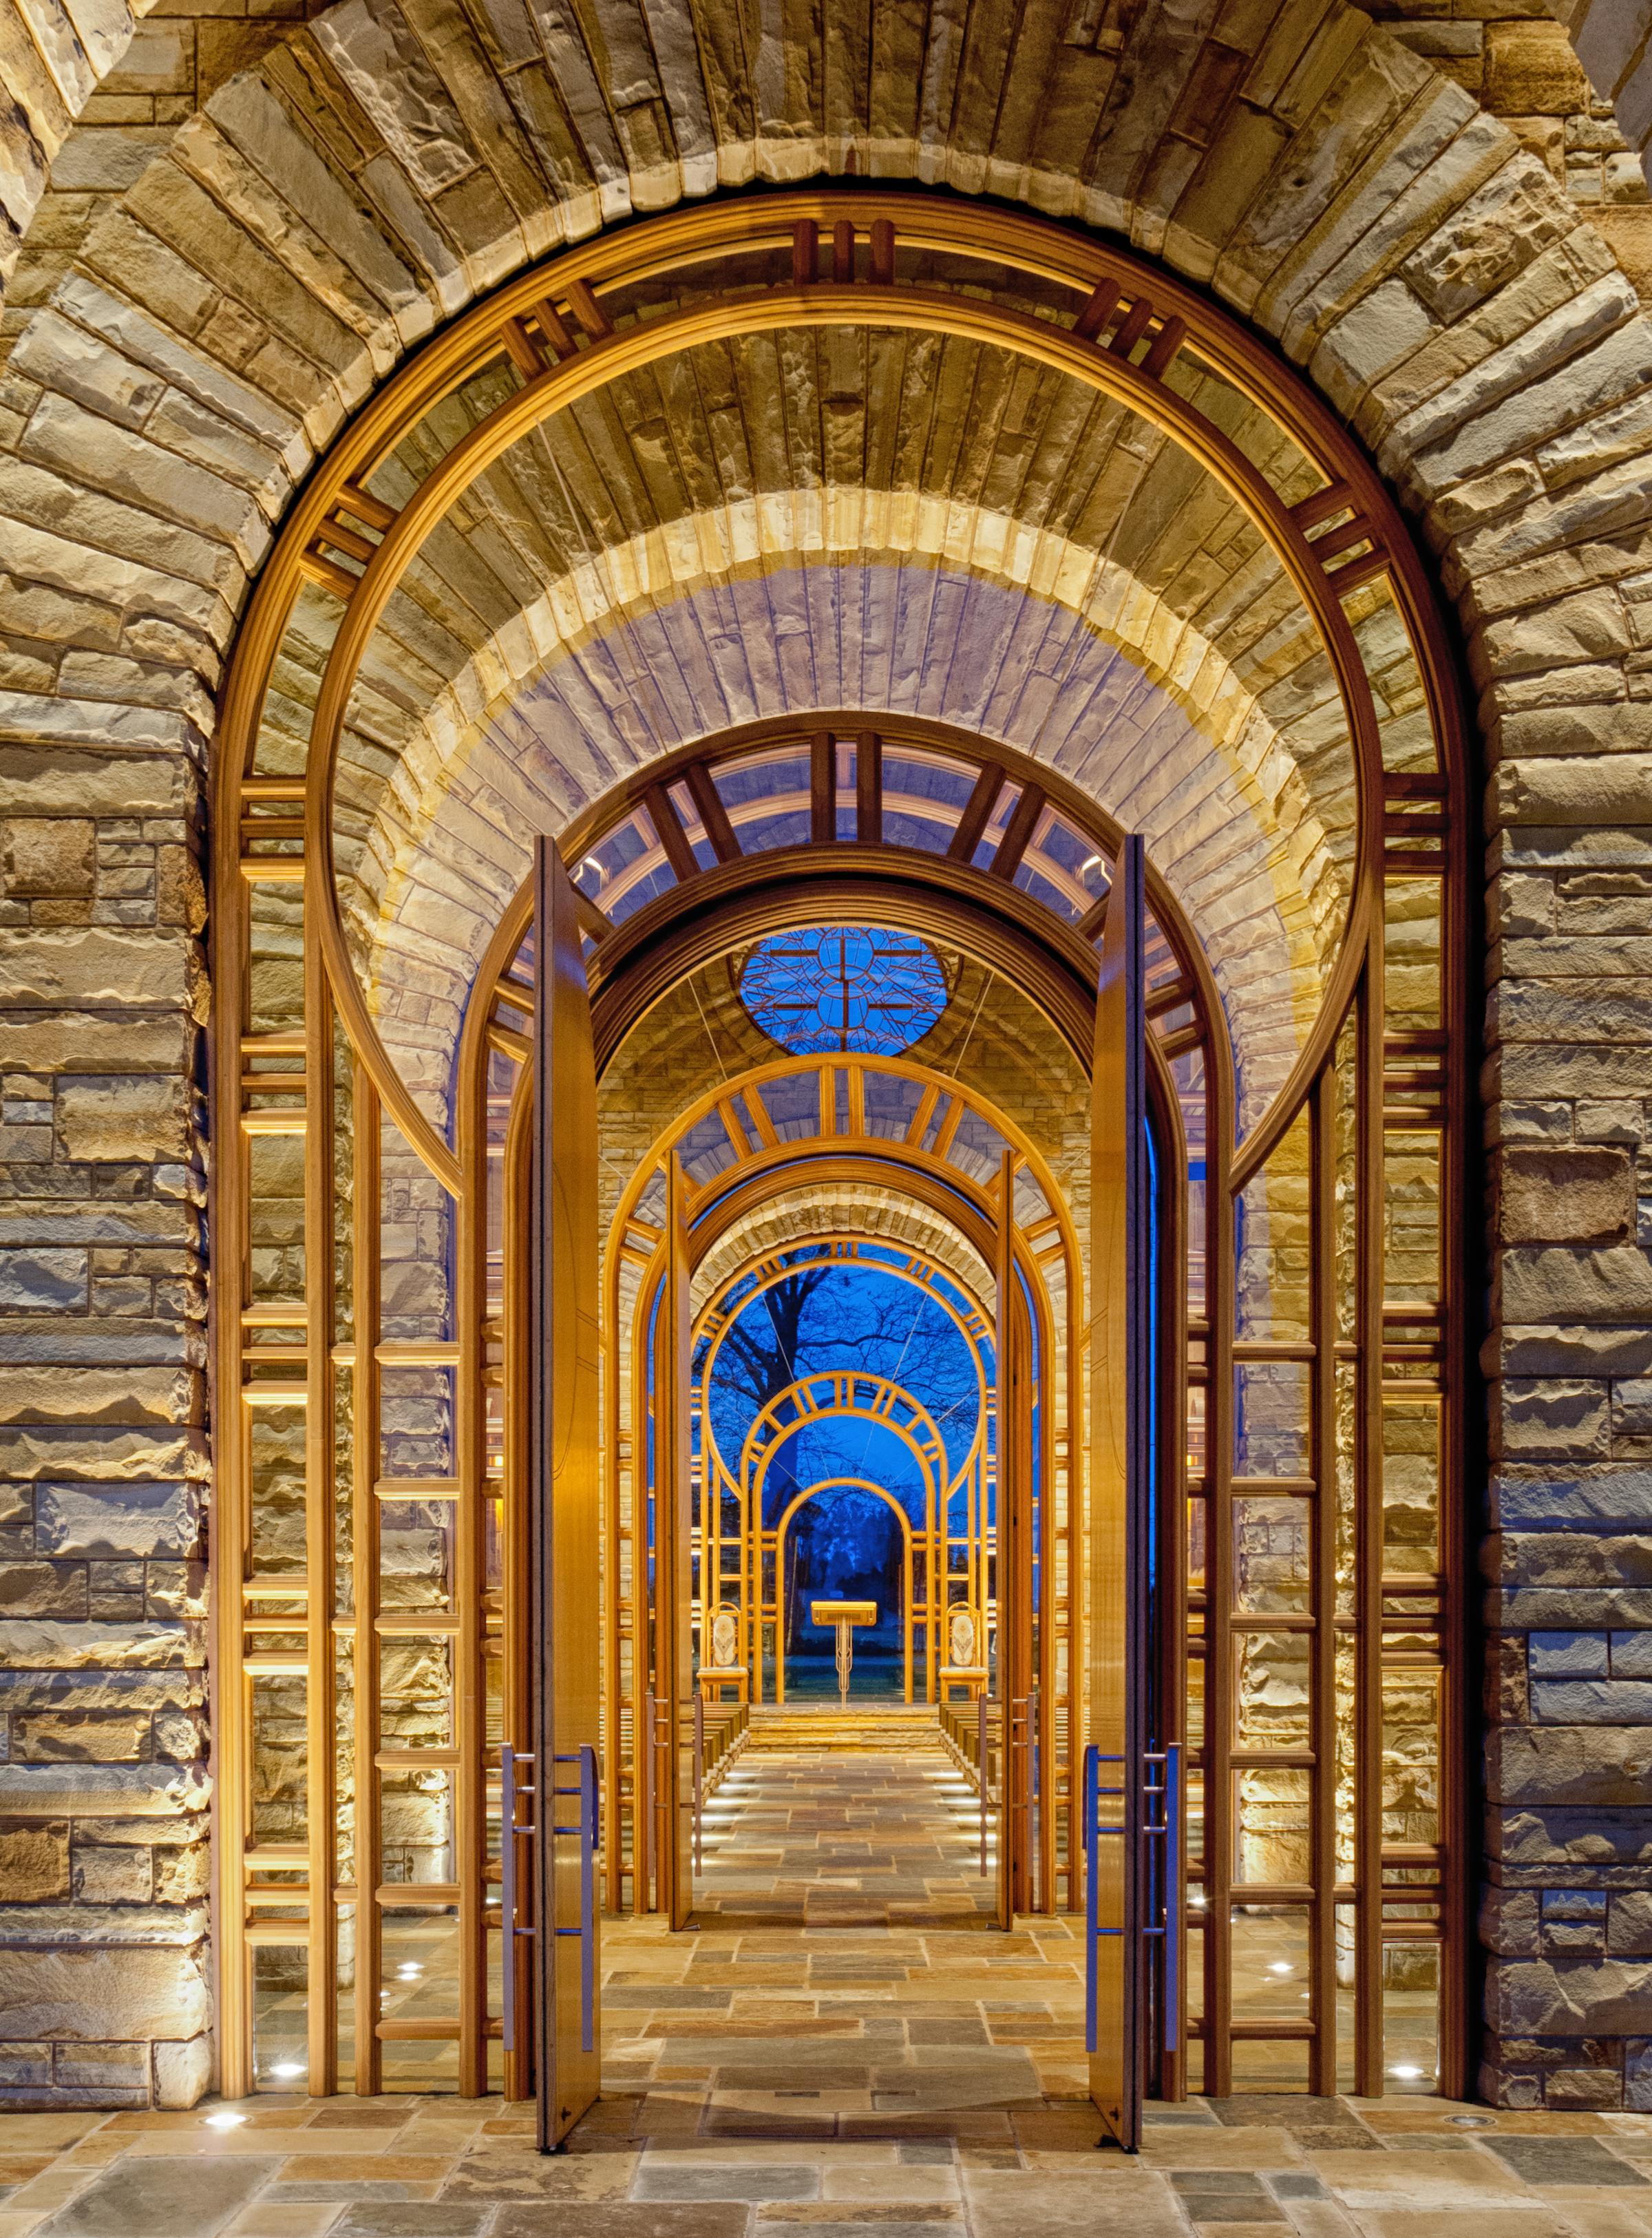 Hunt Chapel | Maurice Jennings + Walter Jennings Architects, PLLC | Rogers, AR (Photographer: Walter Jennings, AIA)